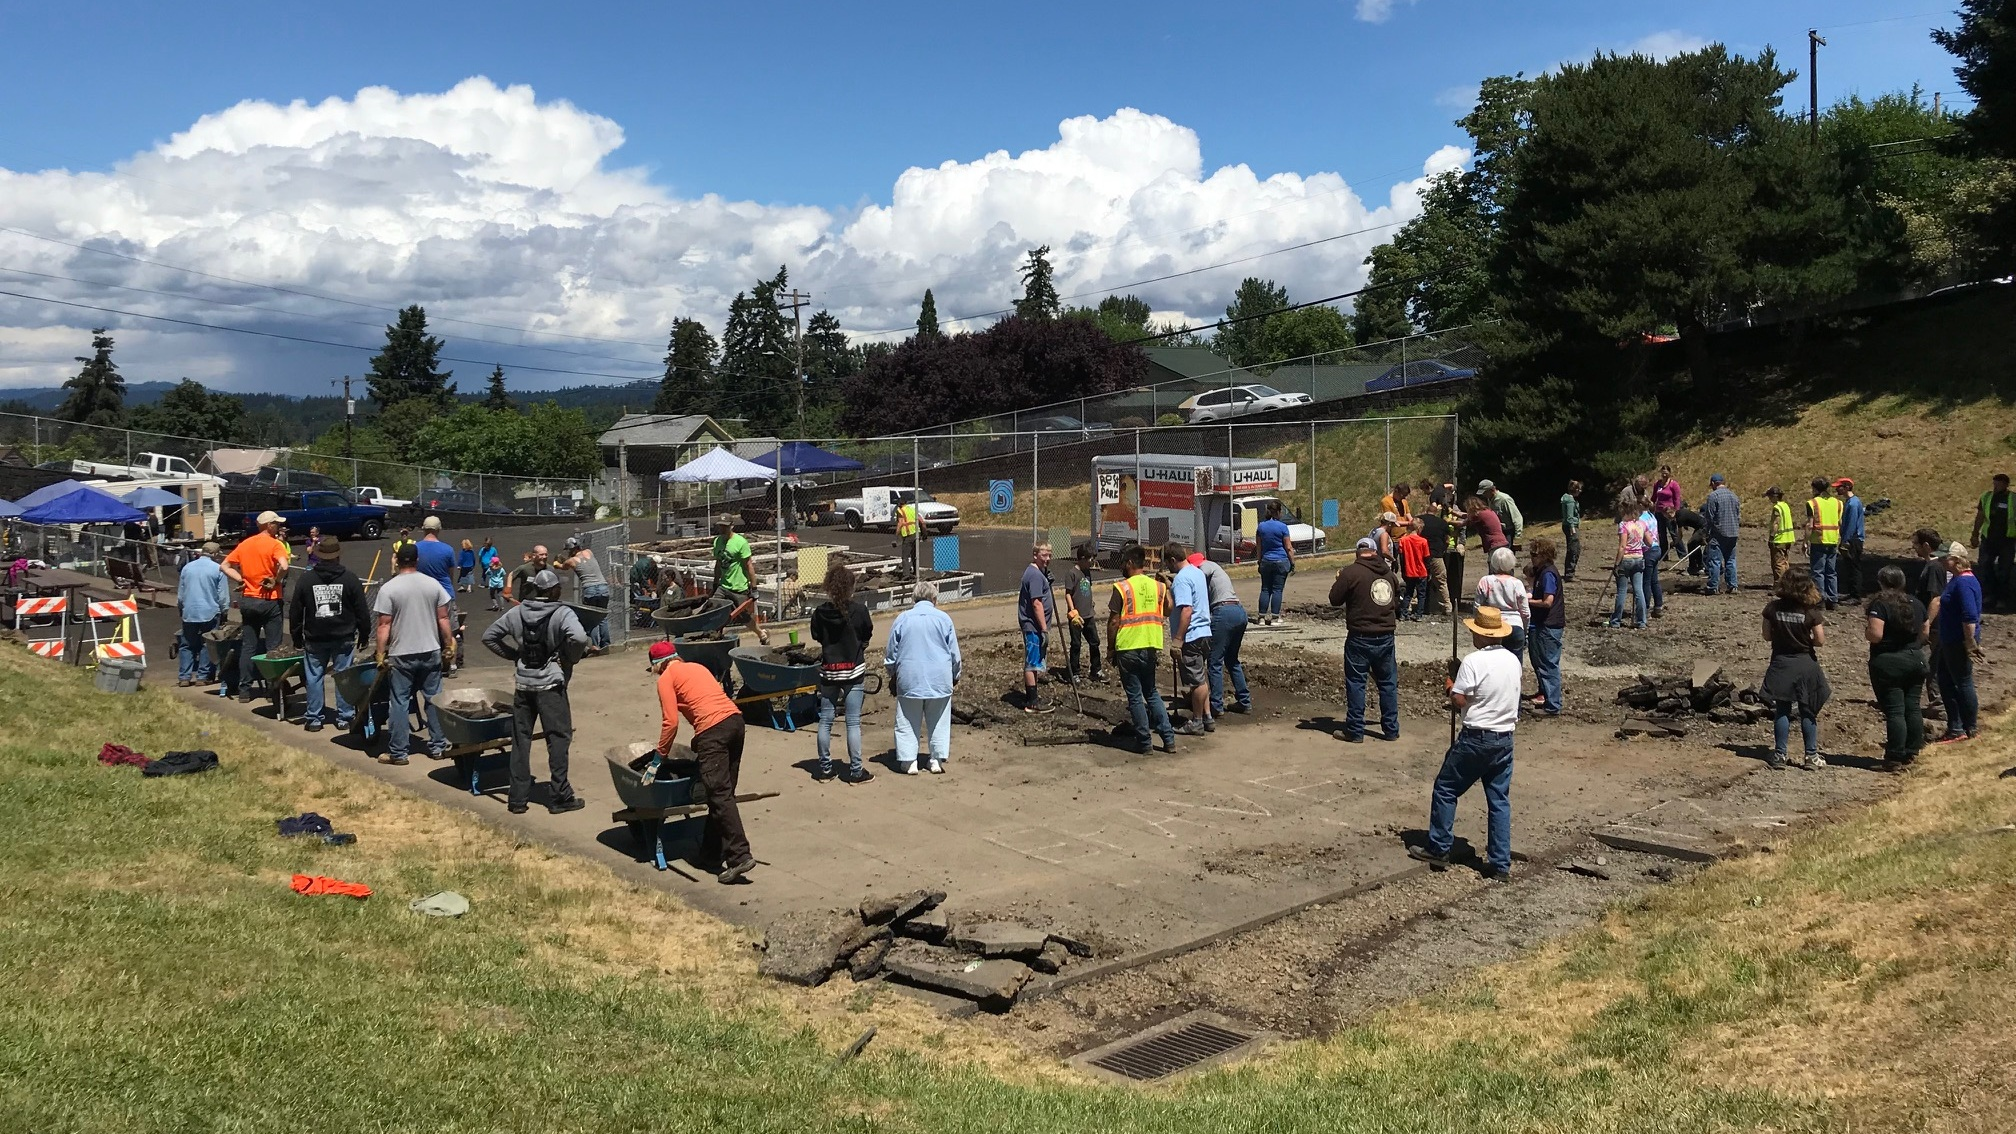 The Depave work party at  Latourette Park  in Oregon City